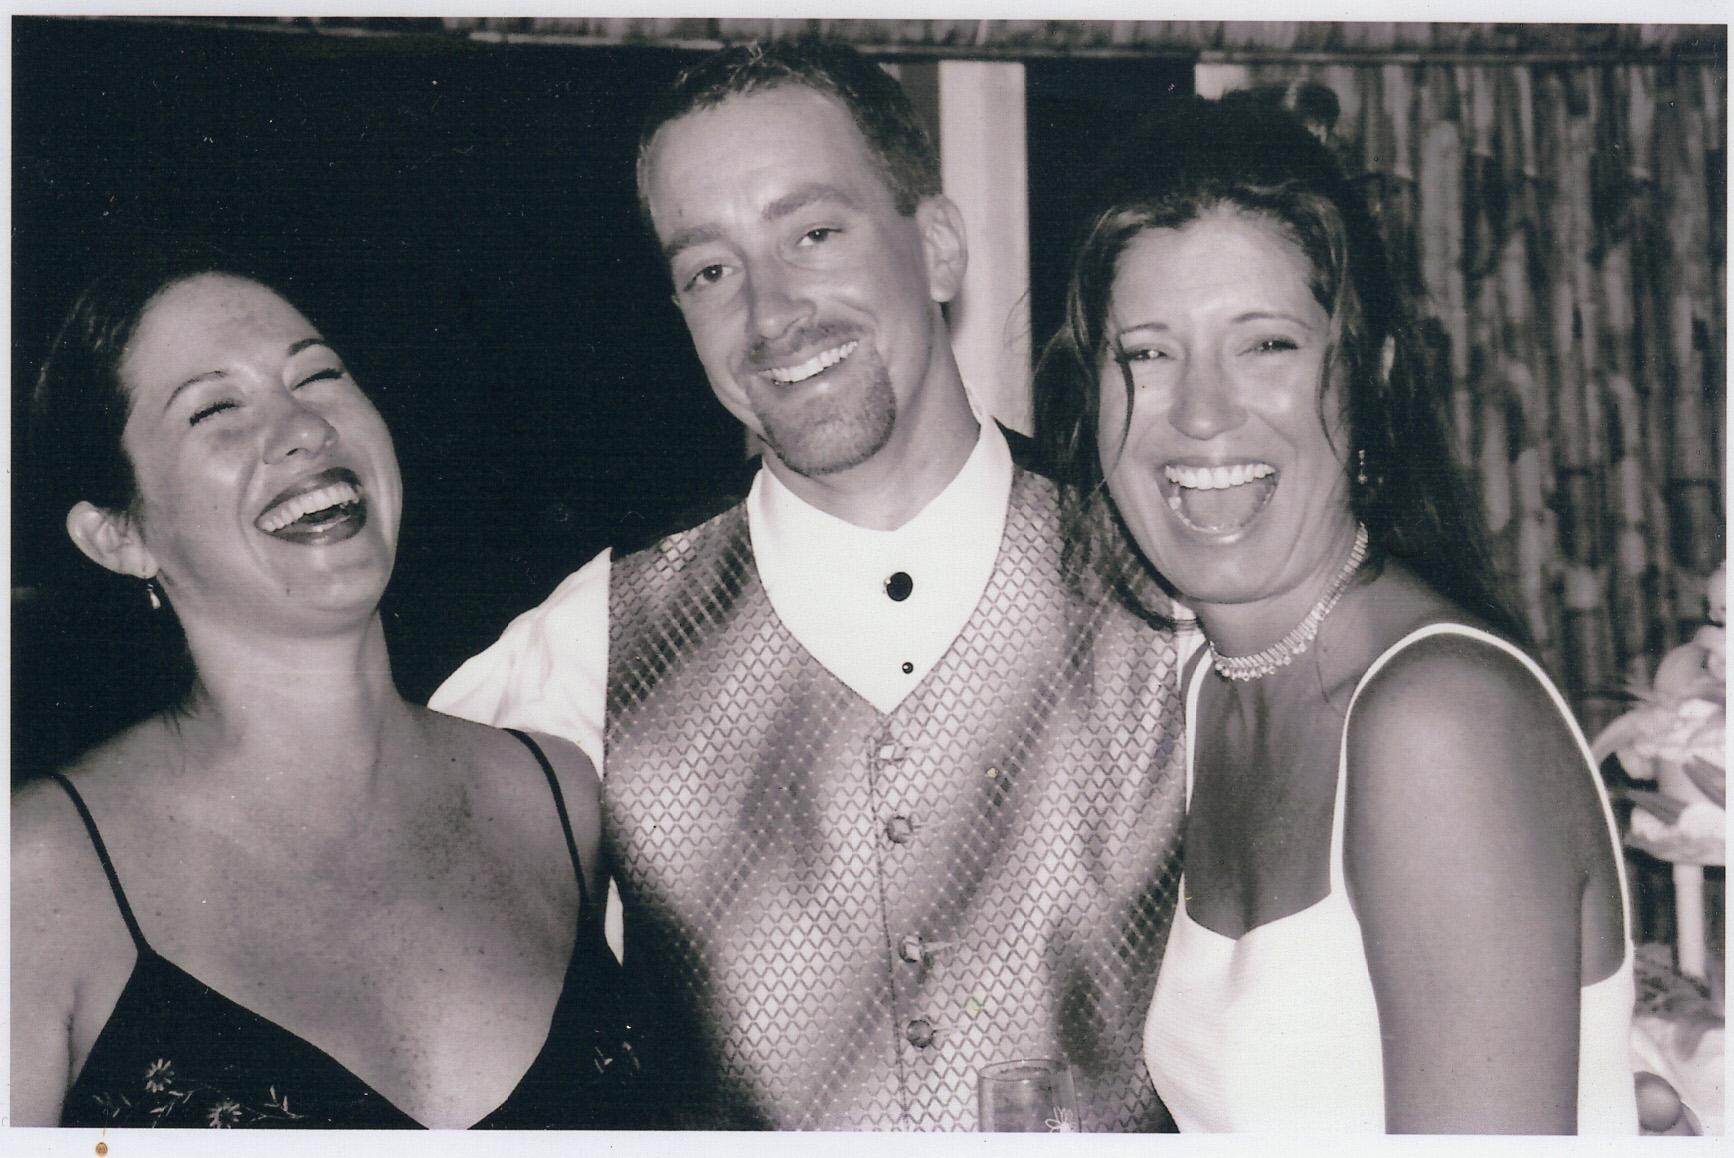 L-R: Me, Scott + Kacy on their wedding day in 2000